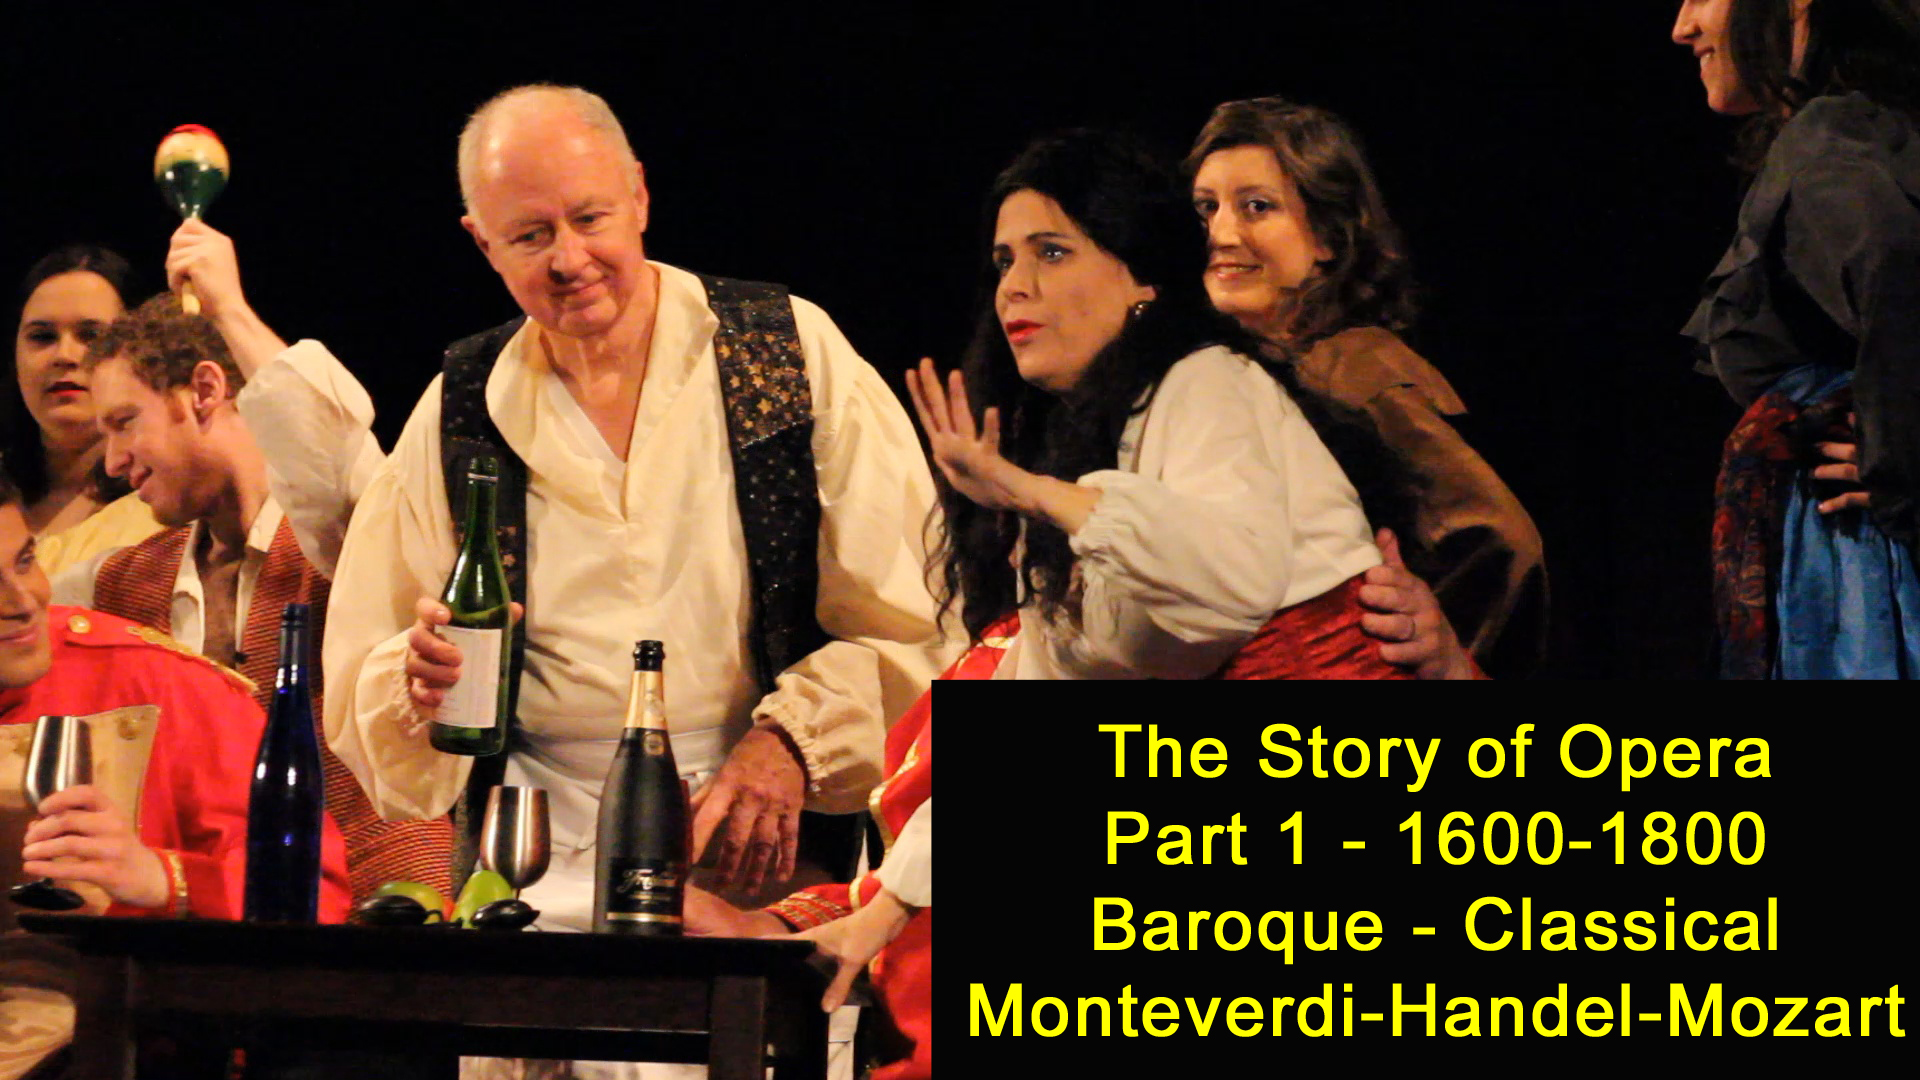 VIRTUAL The Story of Opera Part 1: Early Opera 1600-1800